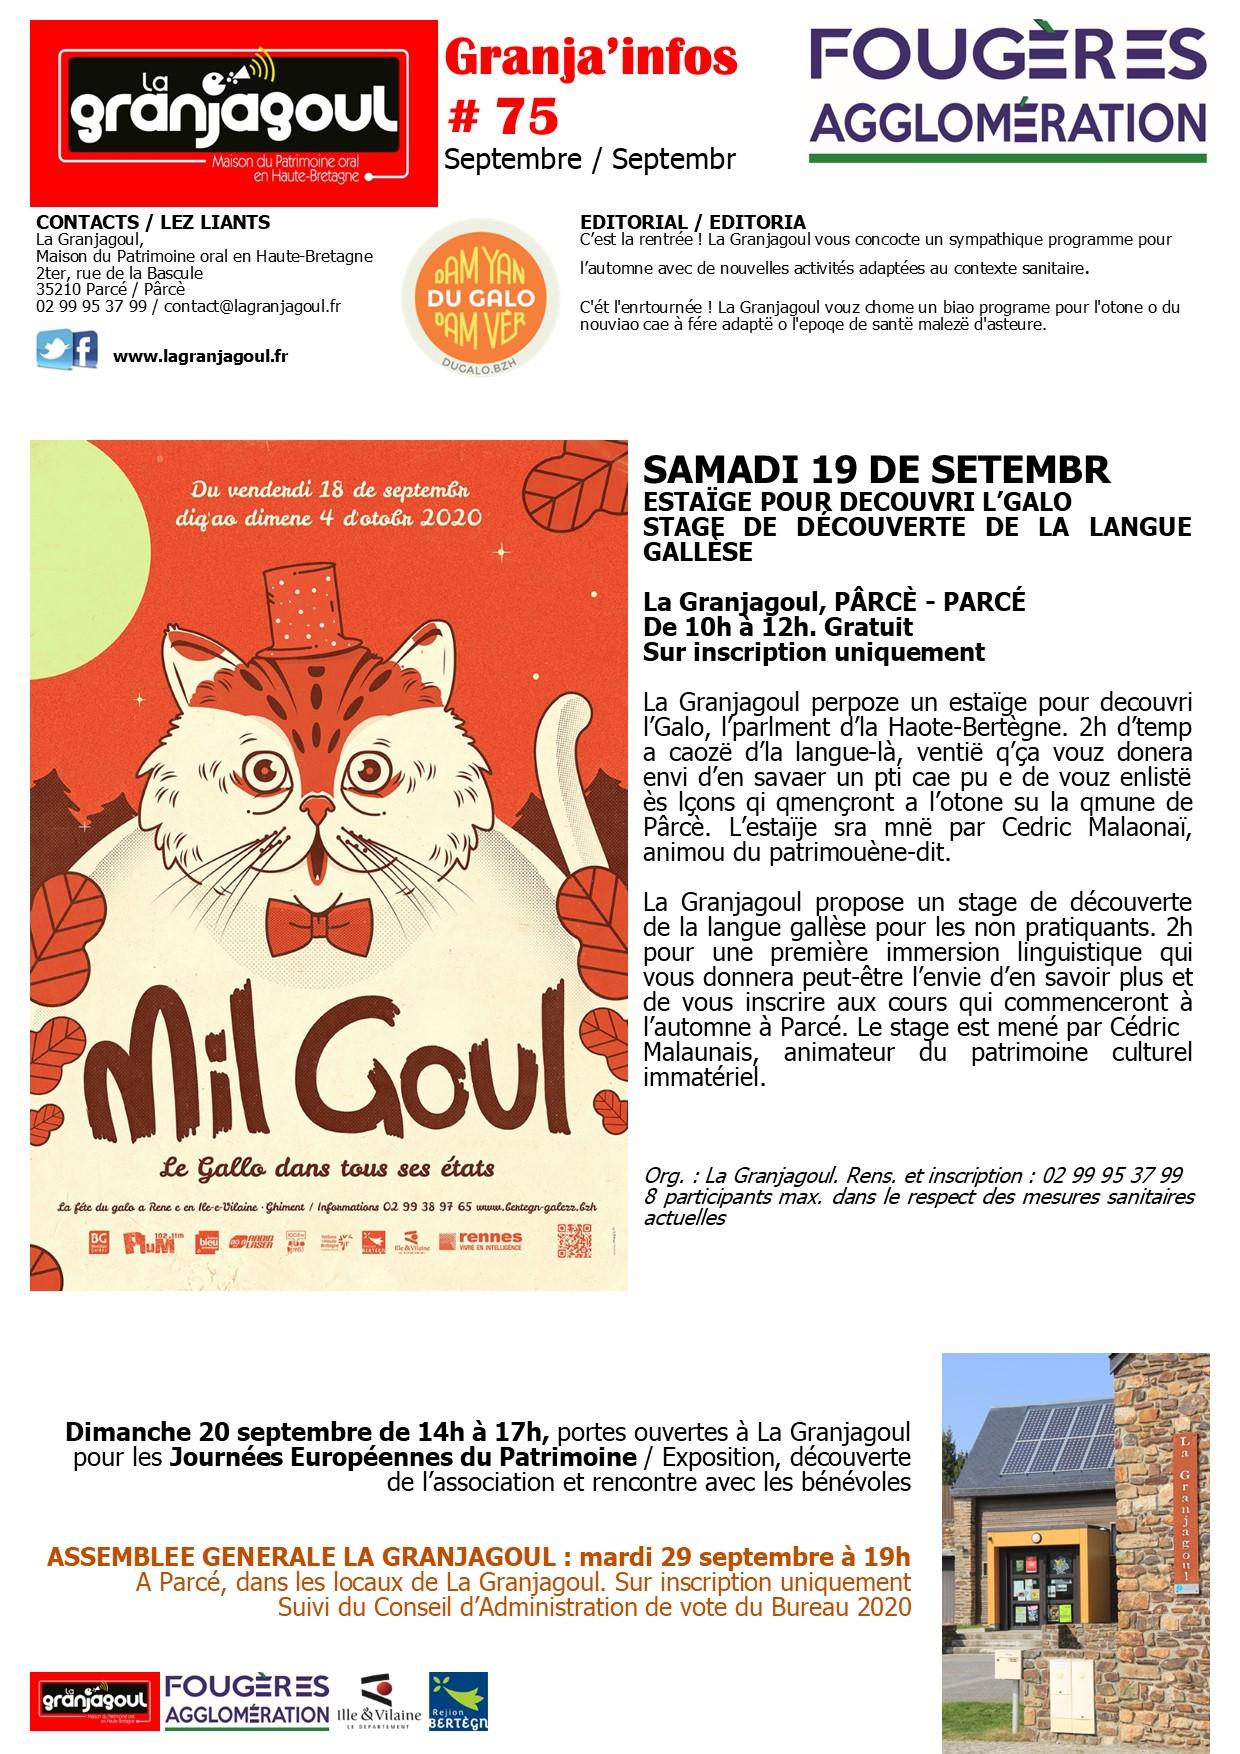 Granja infos n°75 septembre 2020.jpg